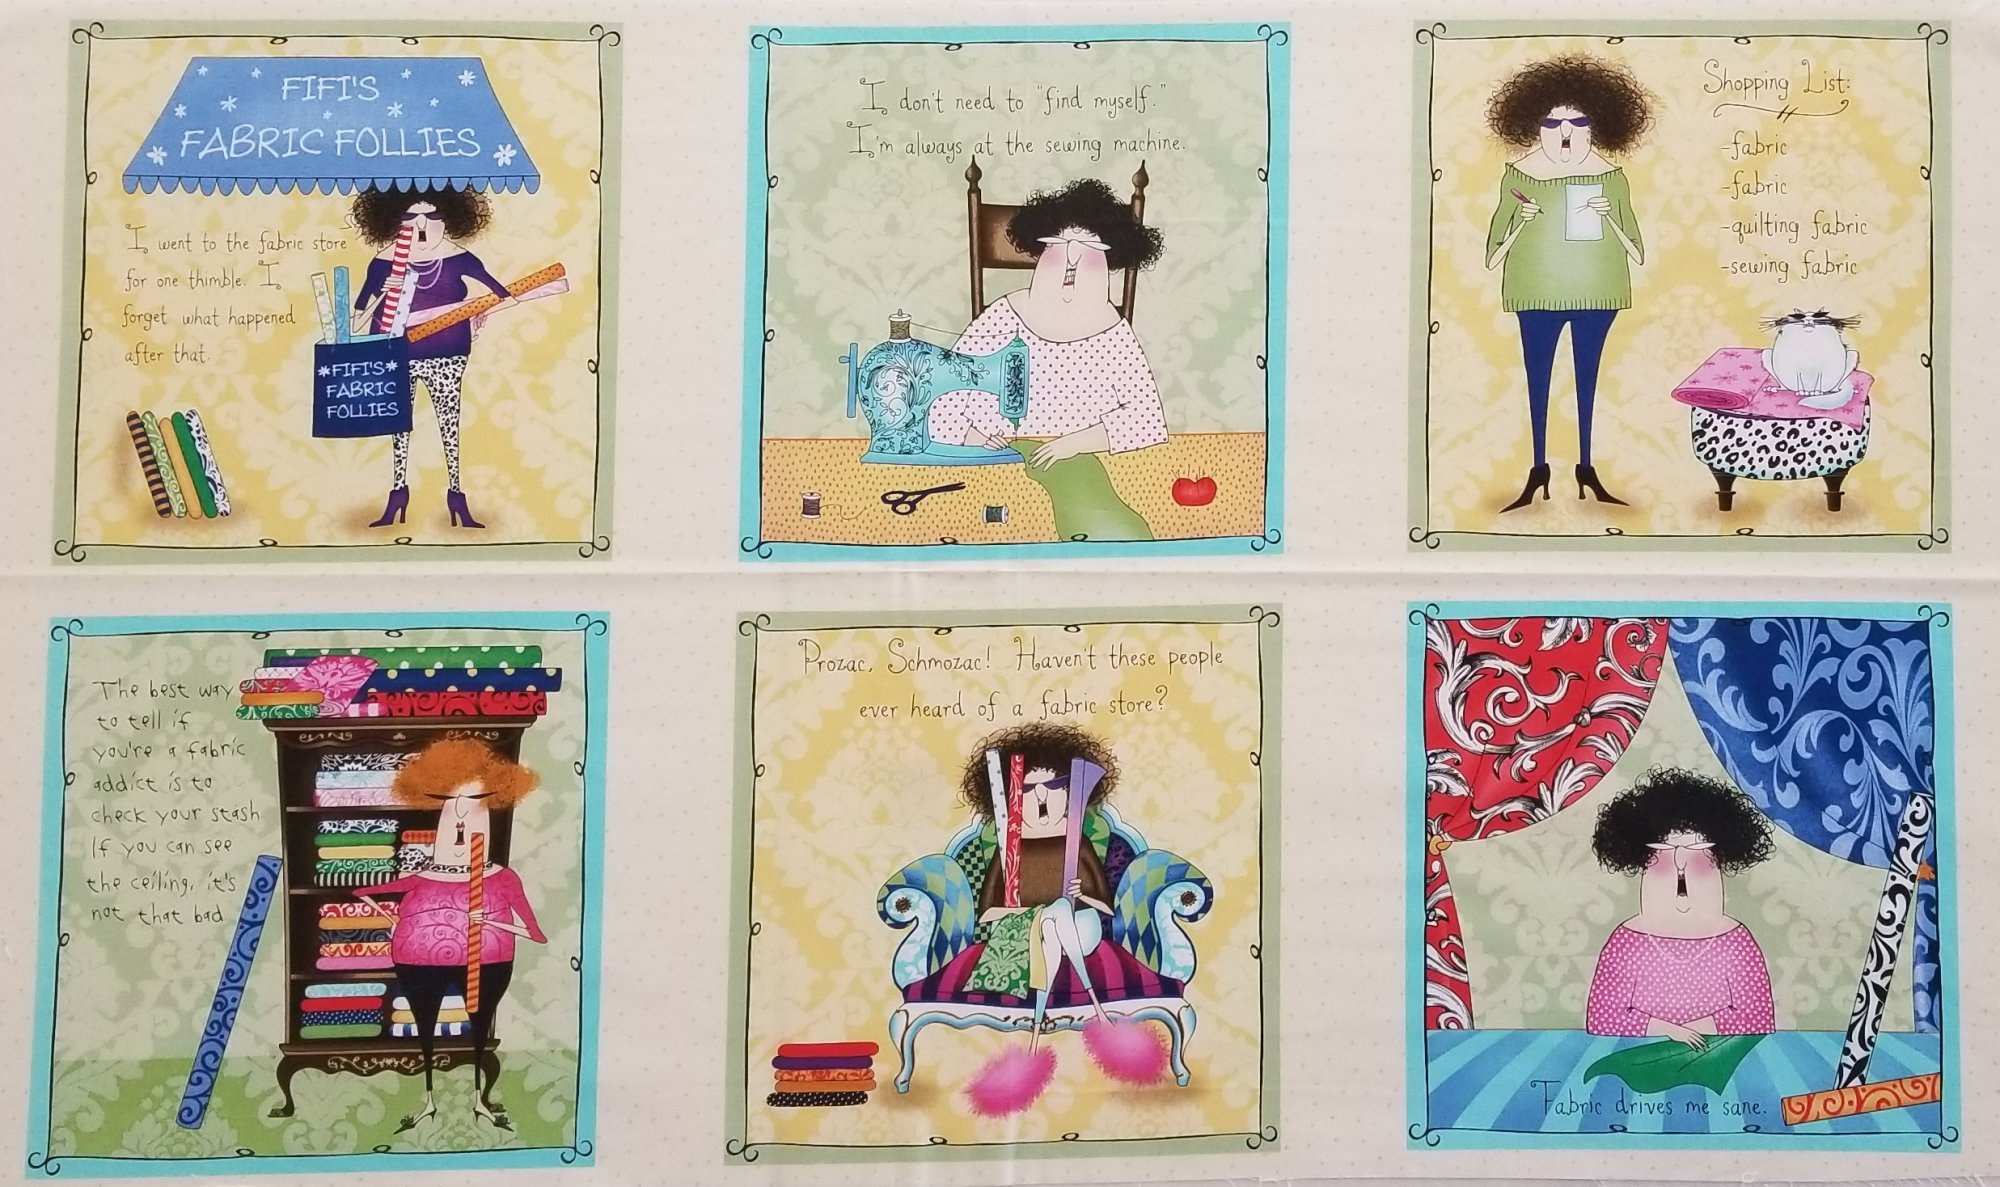 Fifi's Fabric Follies Panel